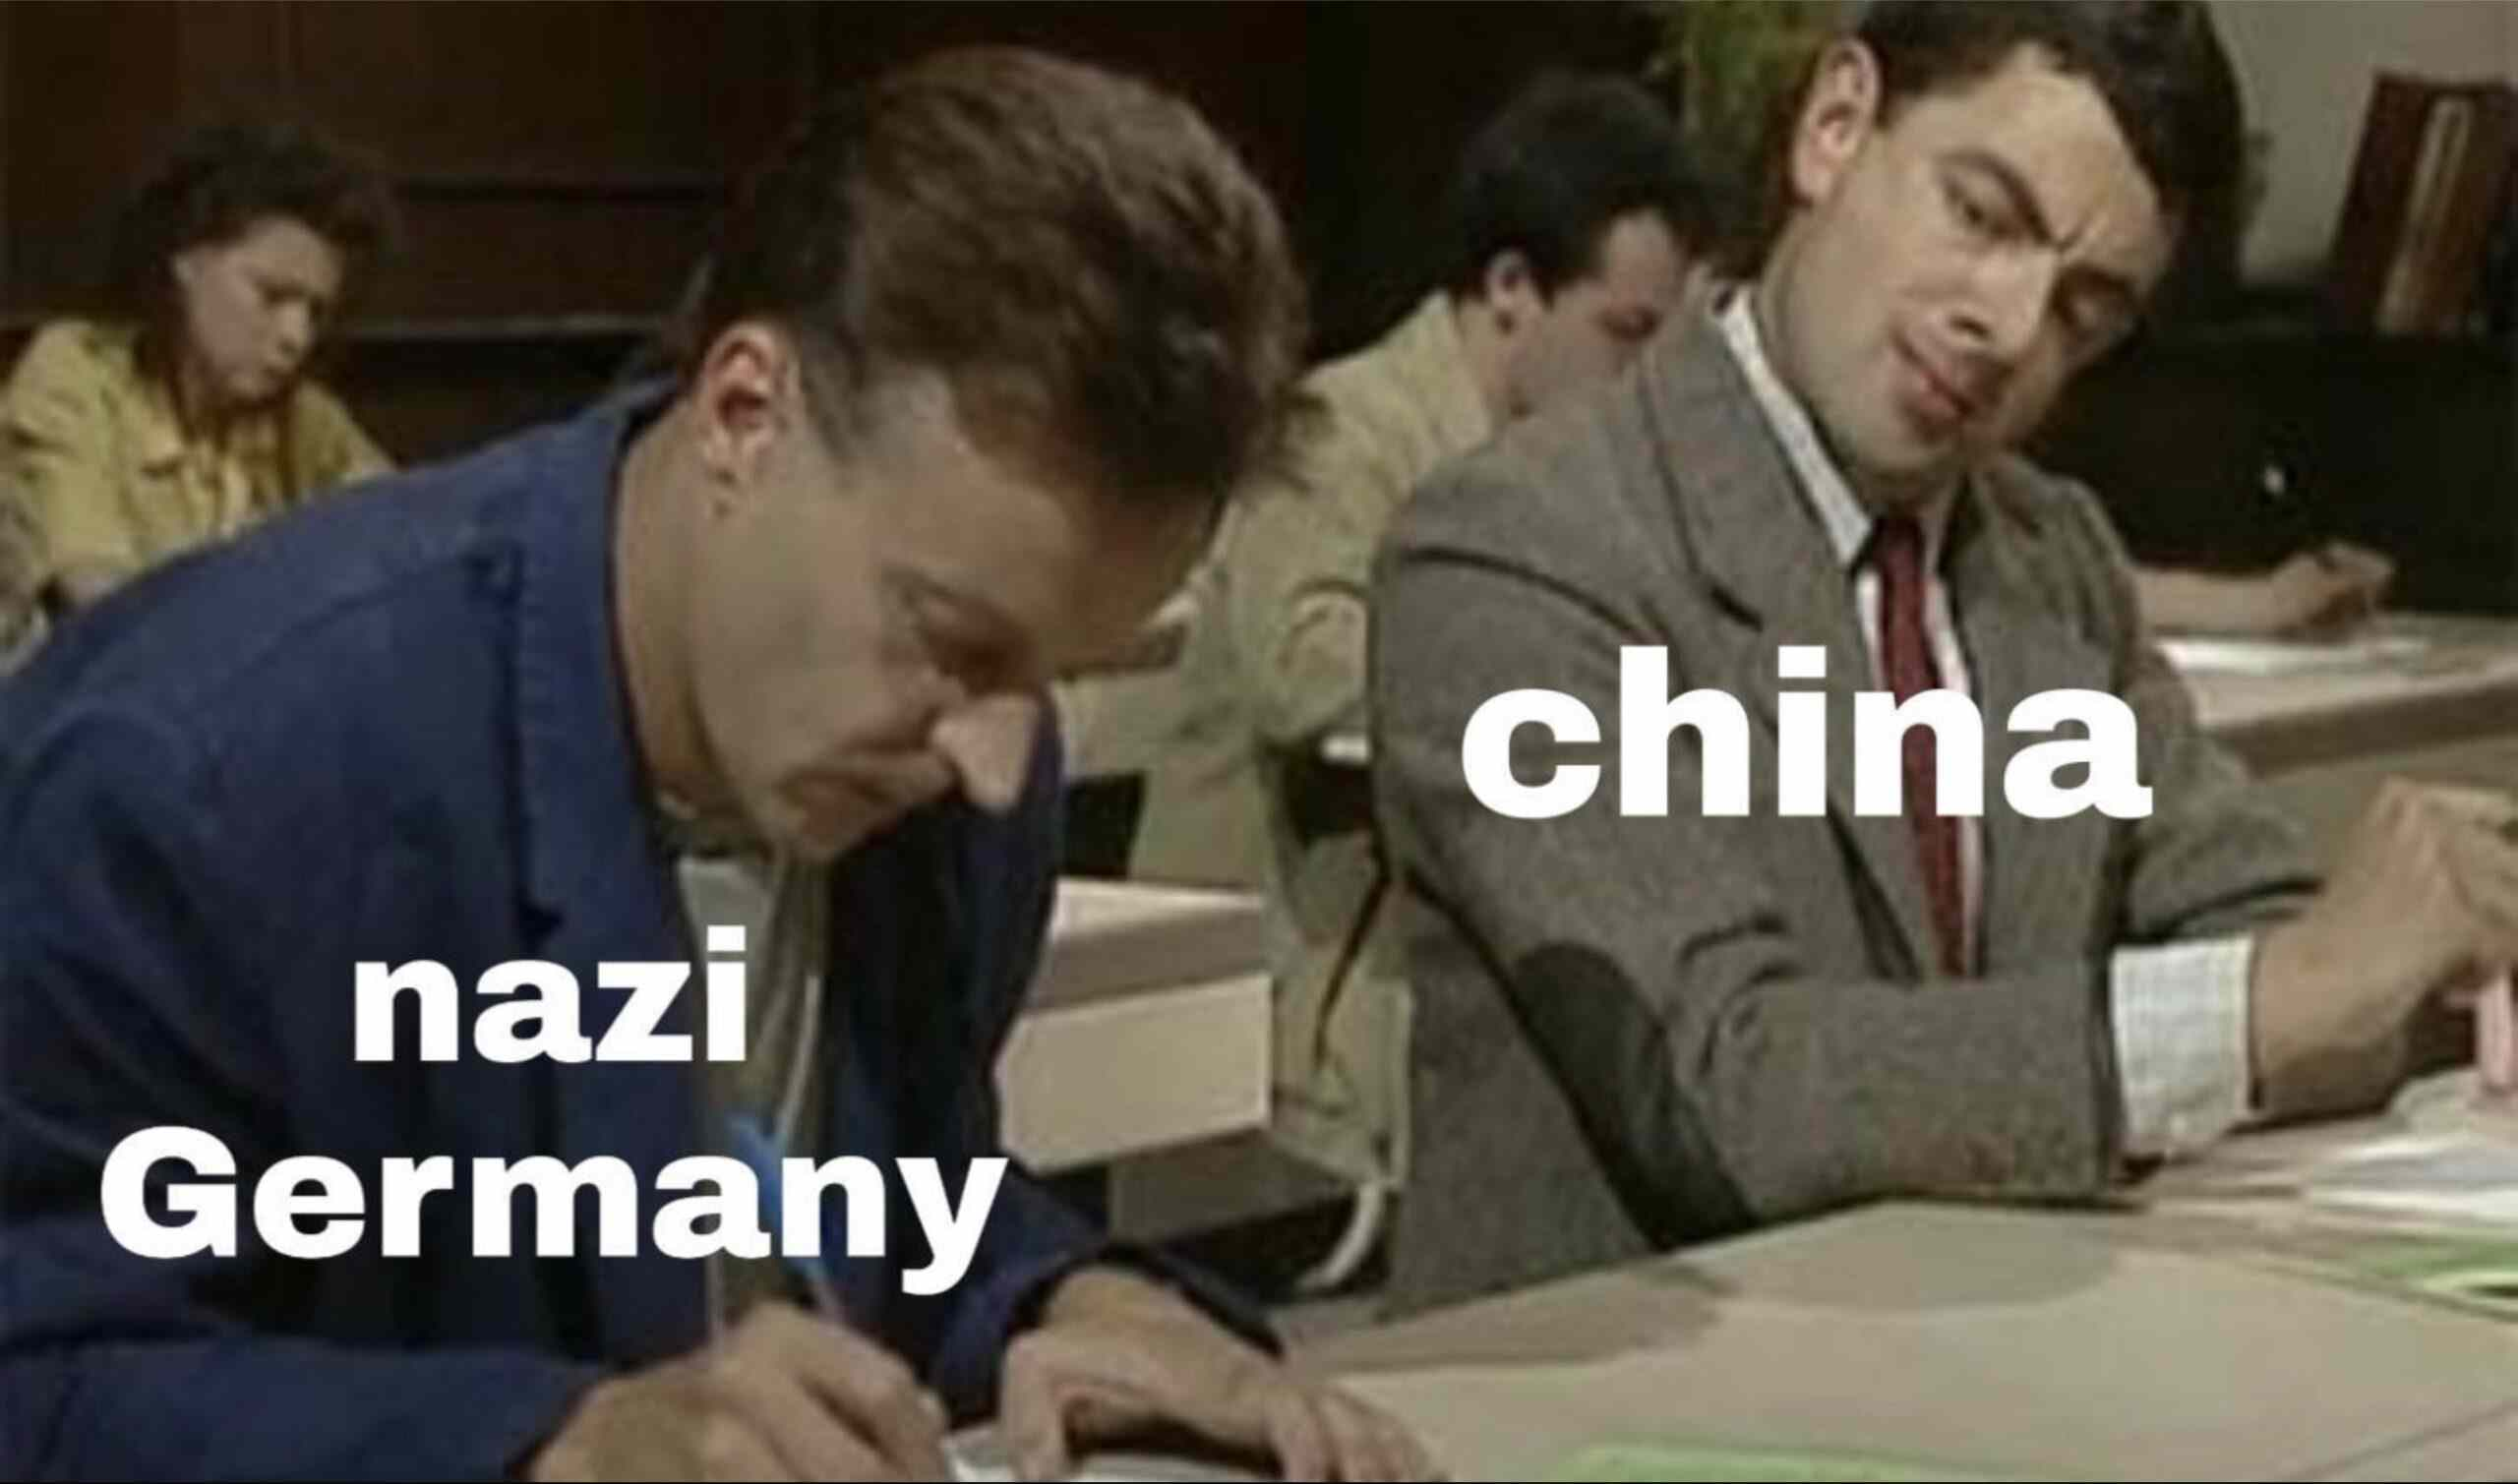 Communist China Nazi Germany